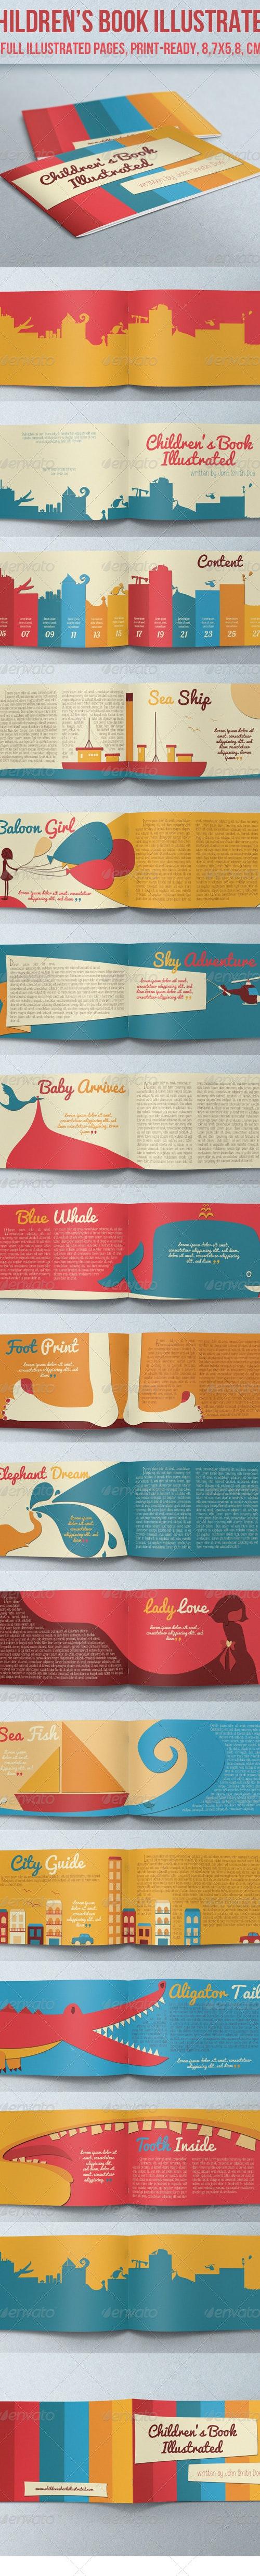 indesign children's book template